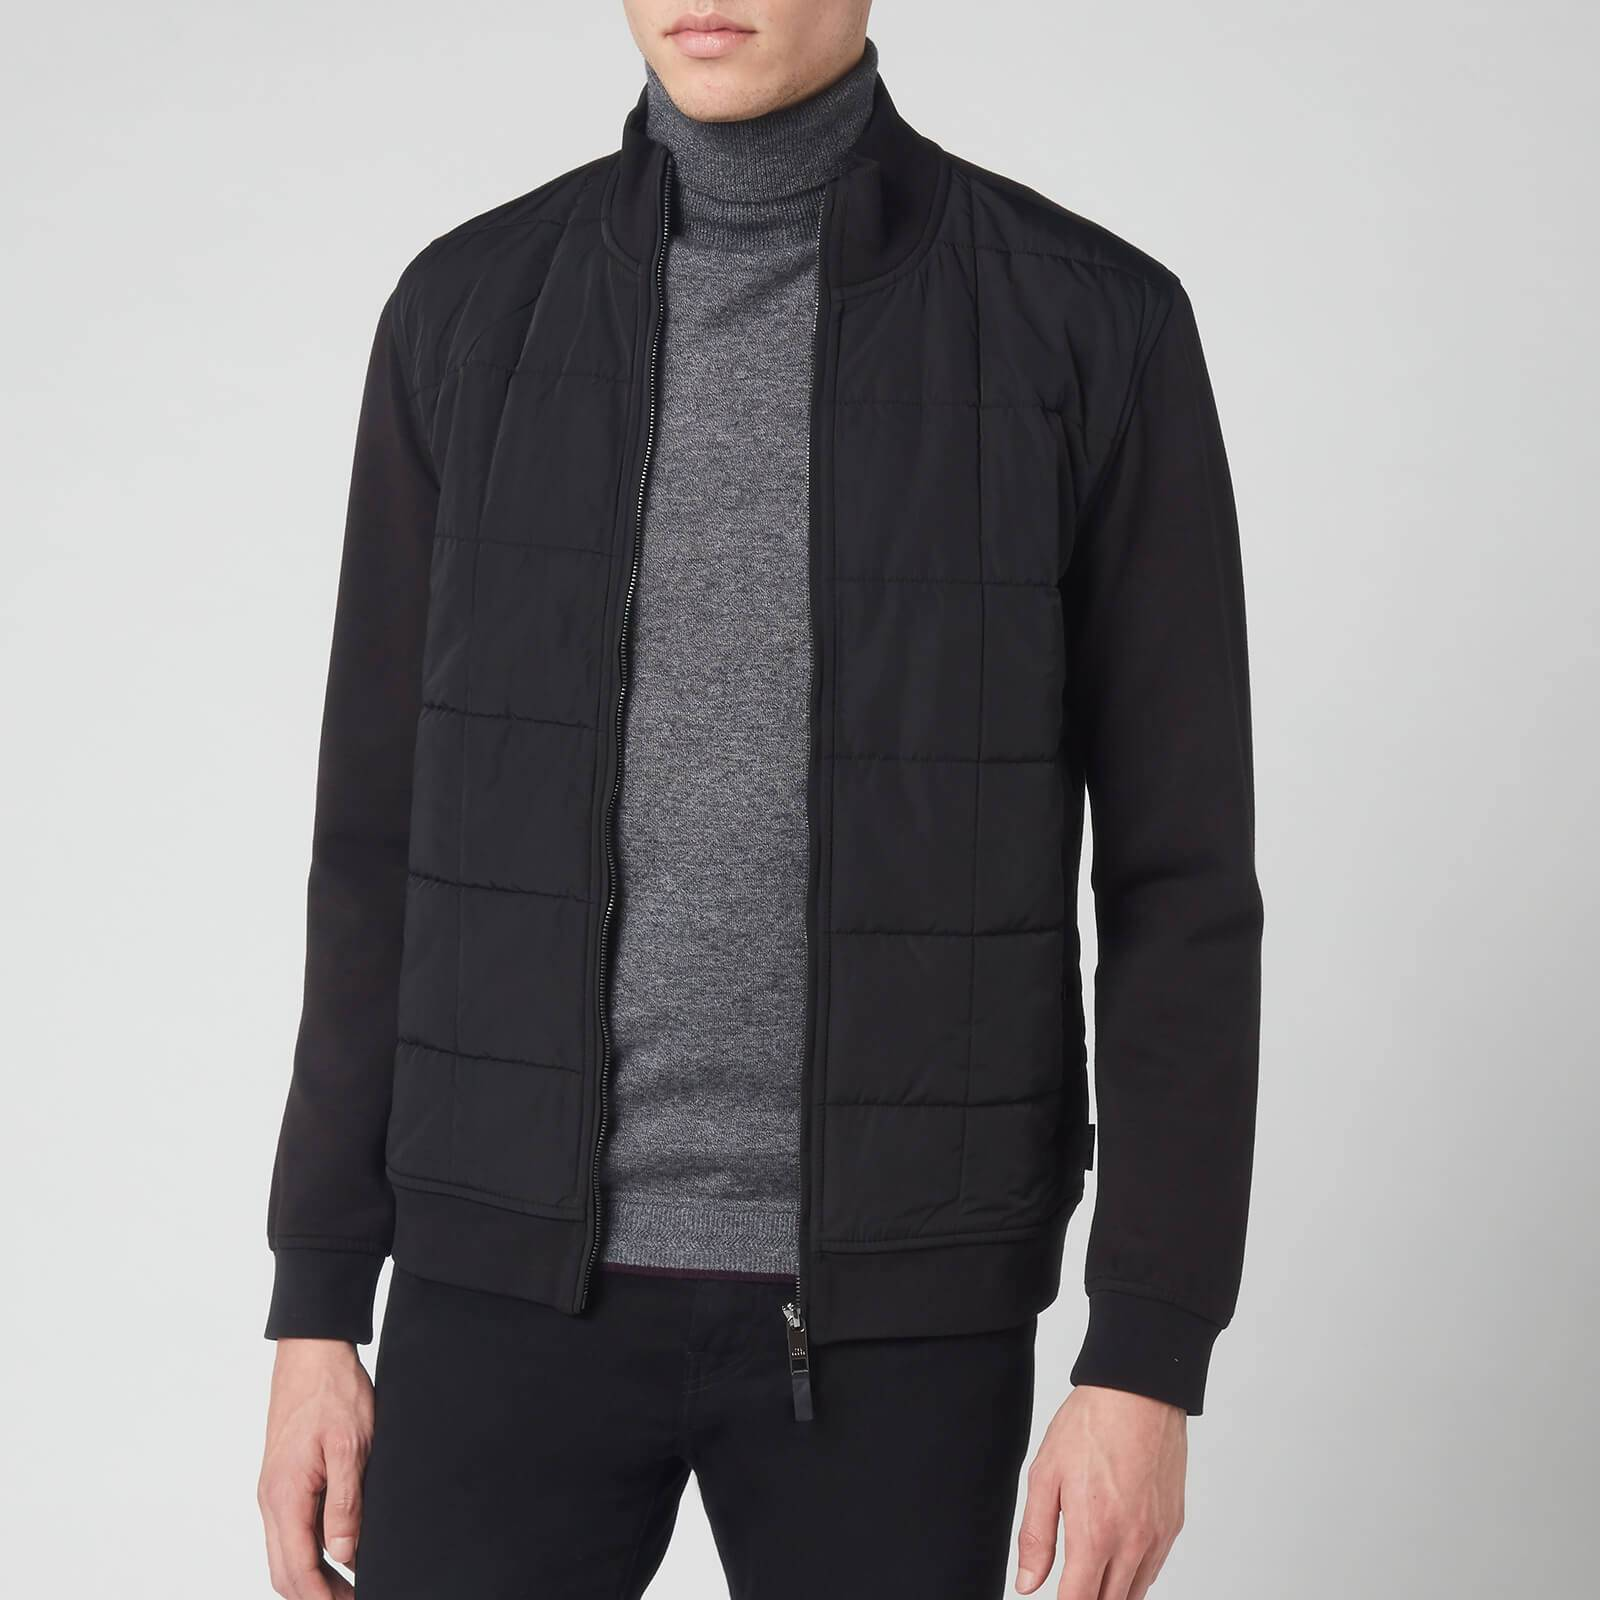 Ted Baker Men's Pasport Long Sleeve Quilted Funnel Neck Sweatshirt - Black - M/3